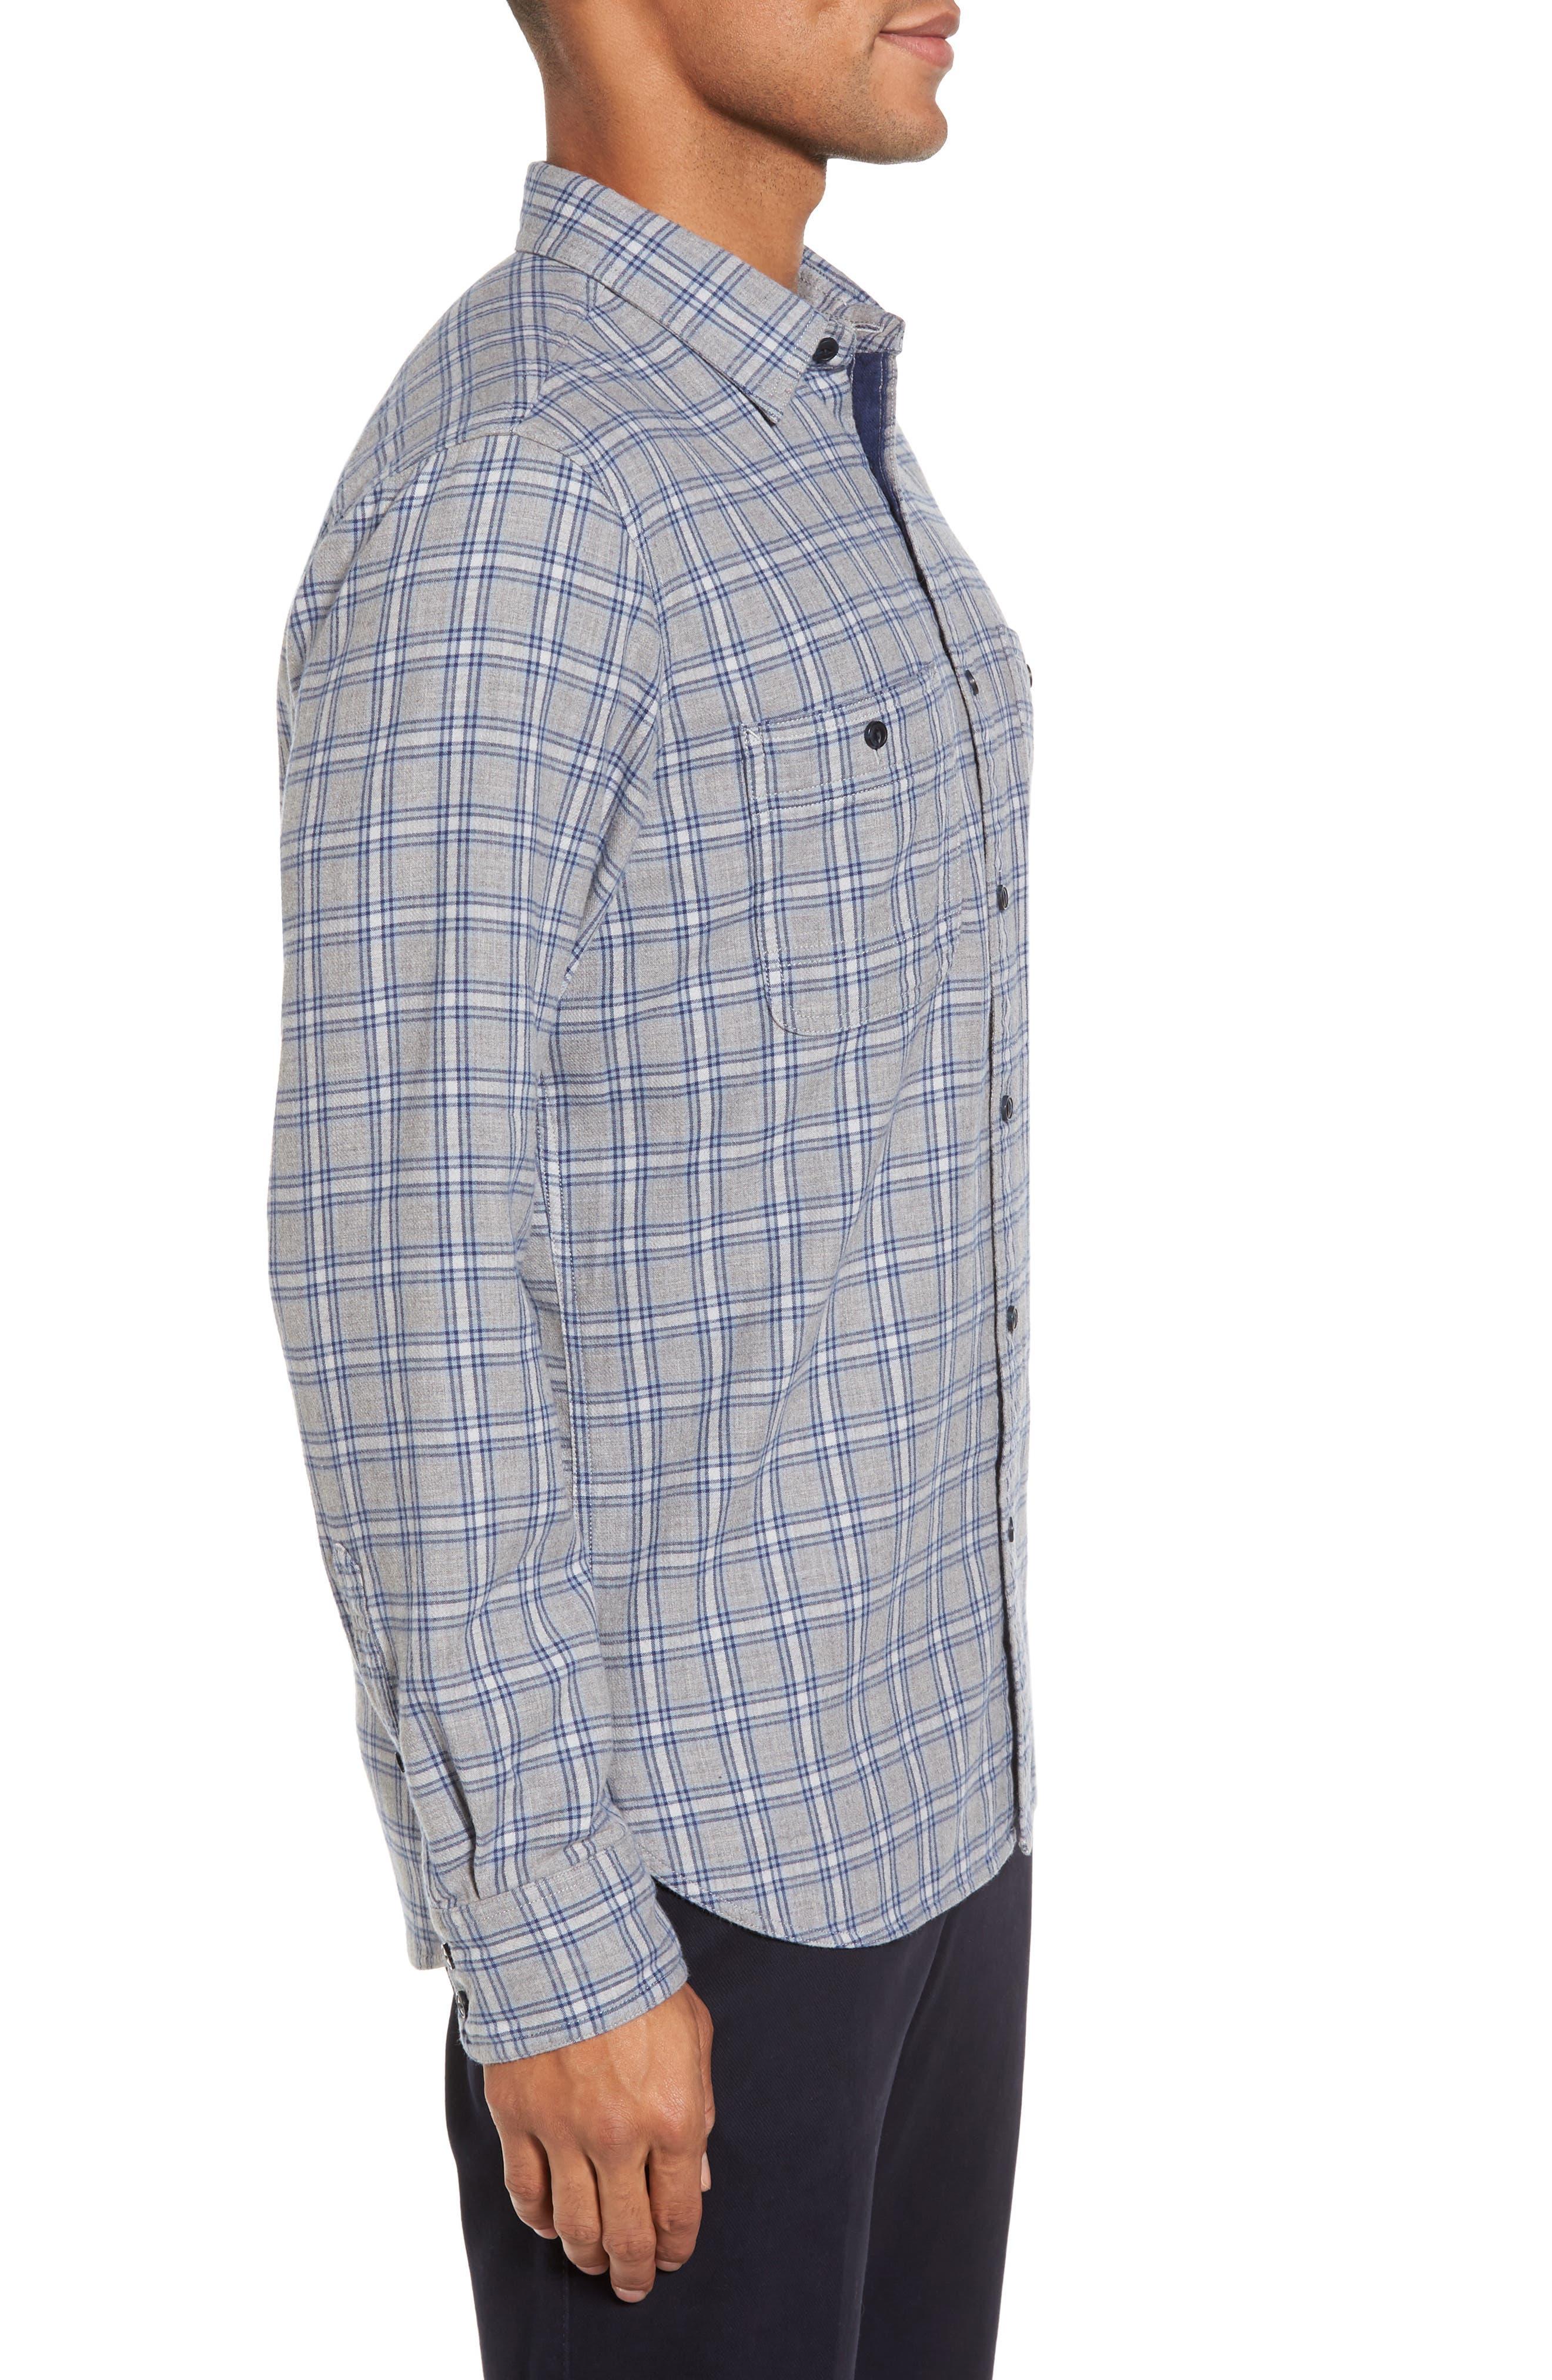 Workwear Duofold Check Sport Shirt,                             Alternate thumbnail 3, color,                             Navy Iris Grey Plaid Duofold